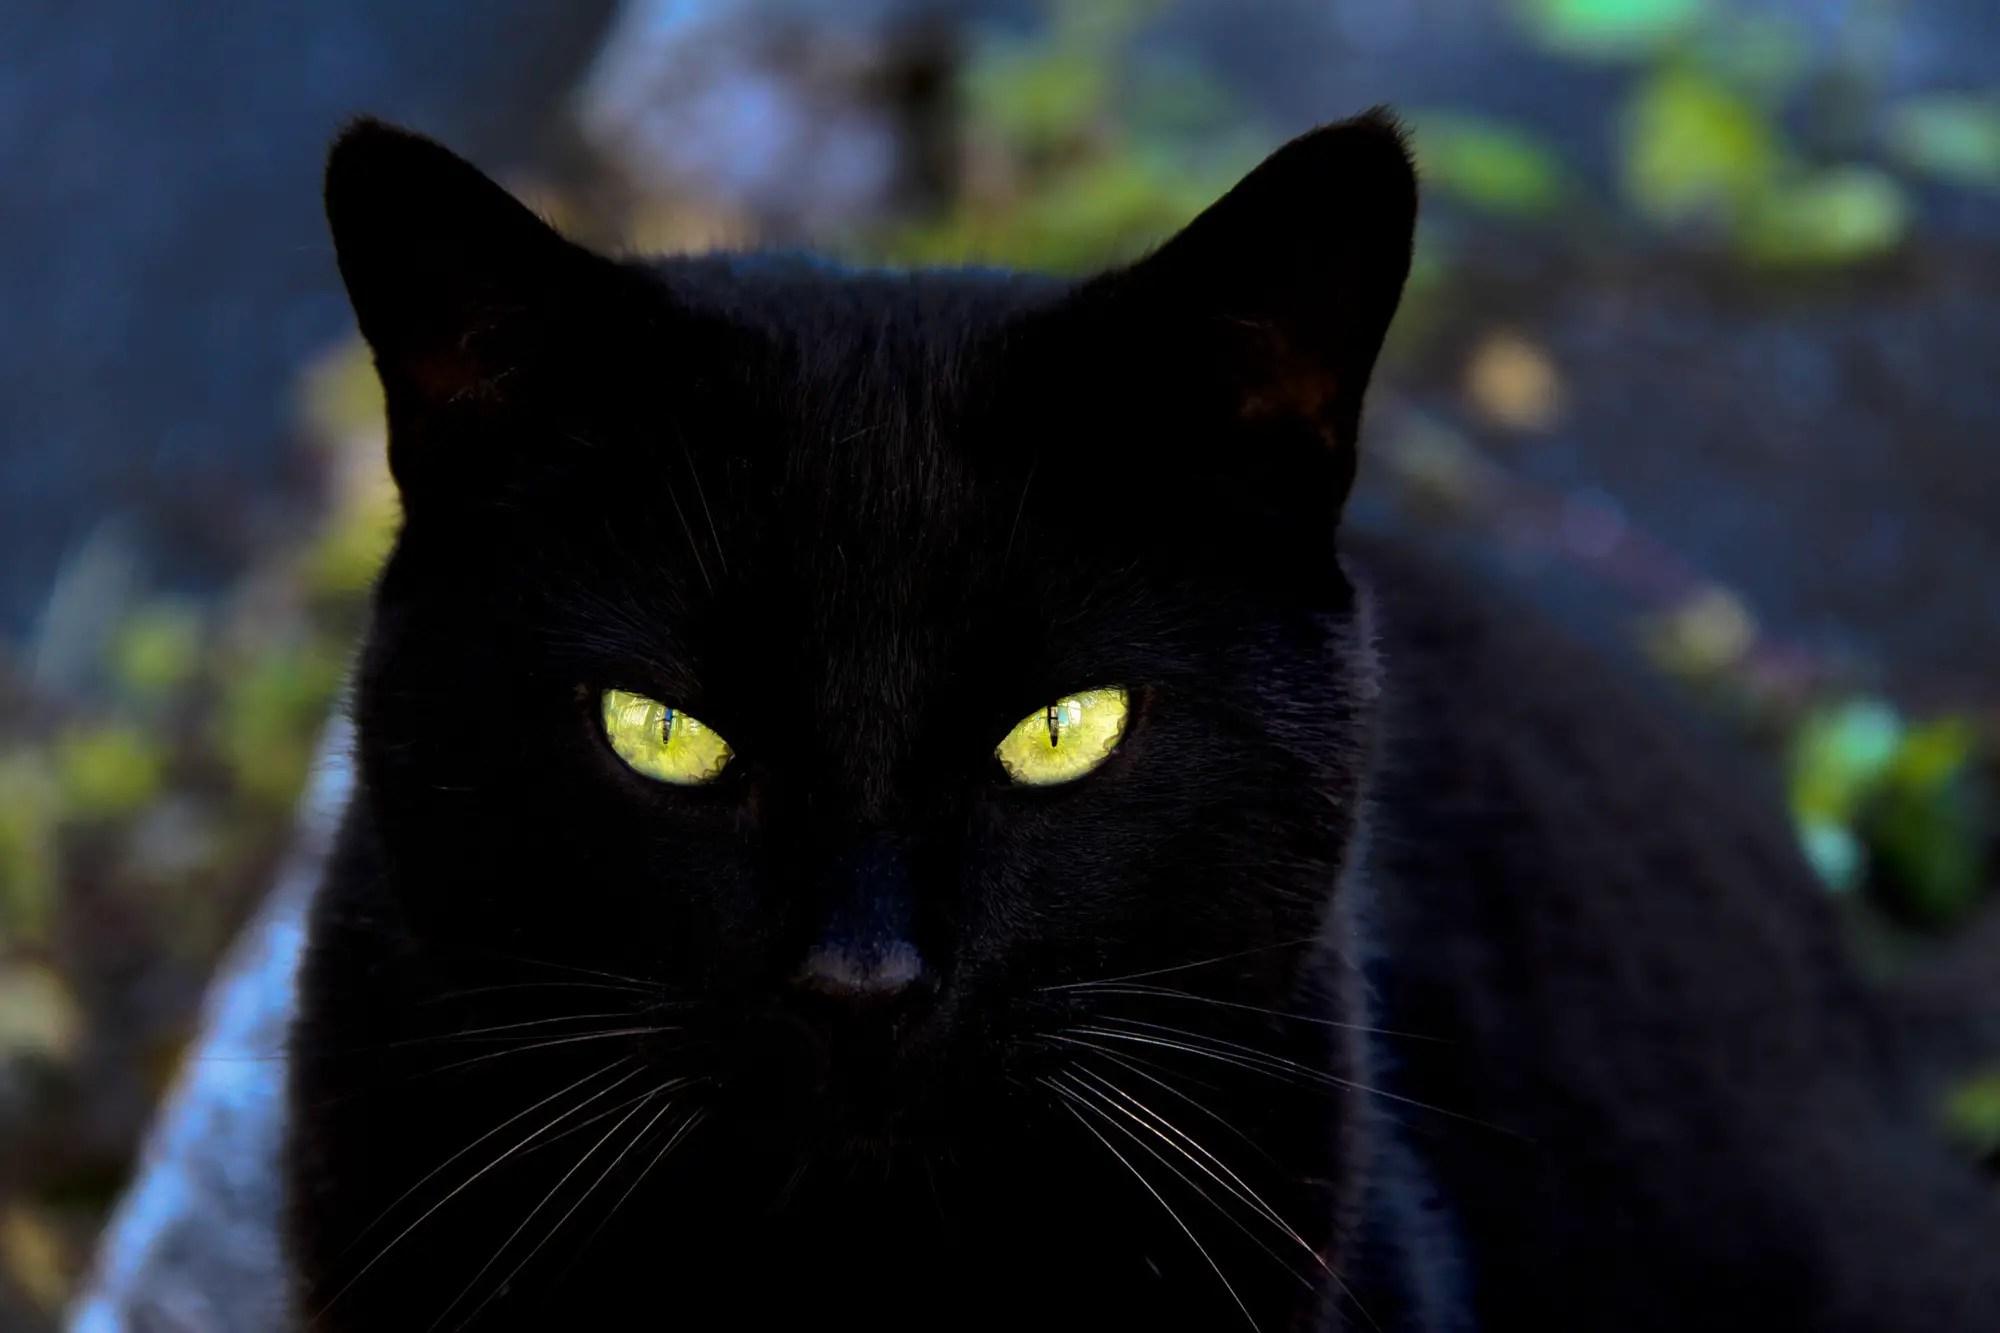 Female cat names z / Wabi coin and walmart videos